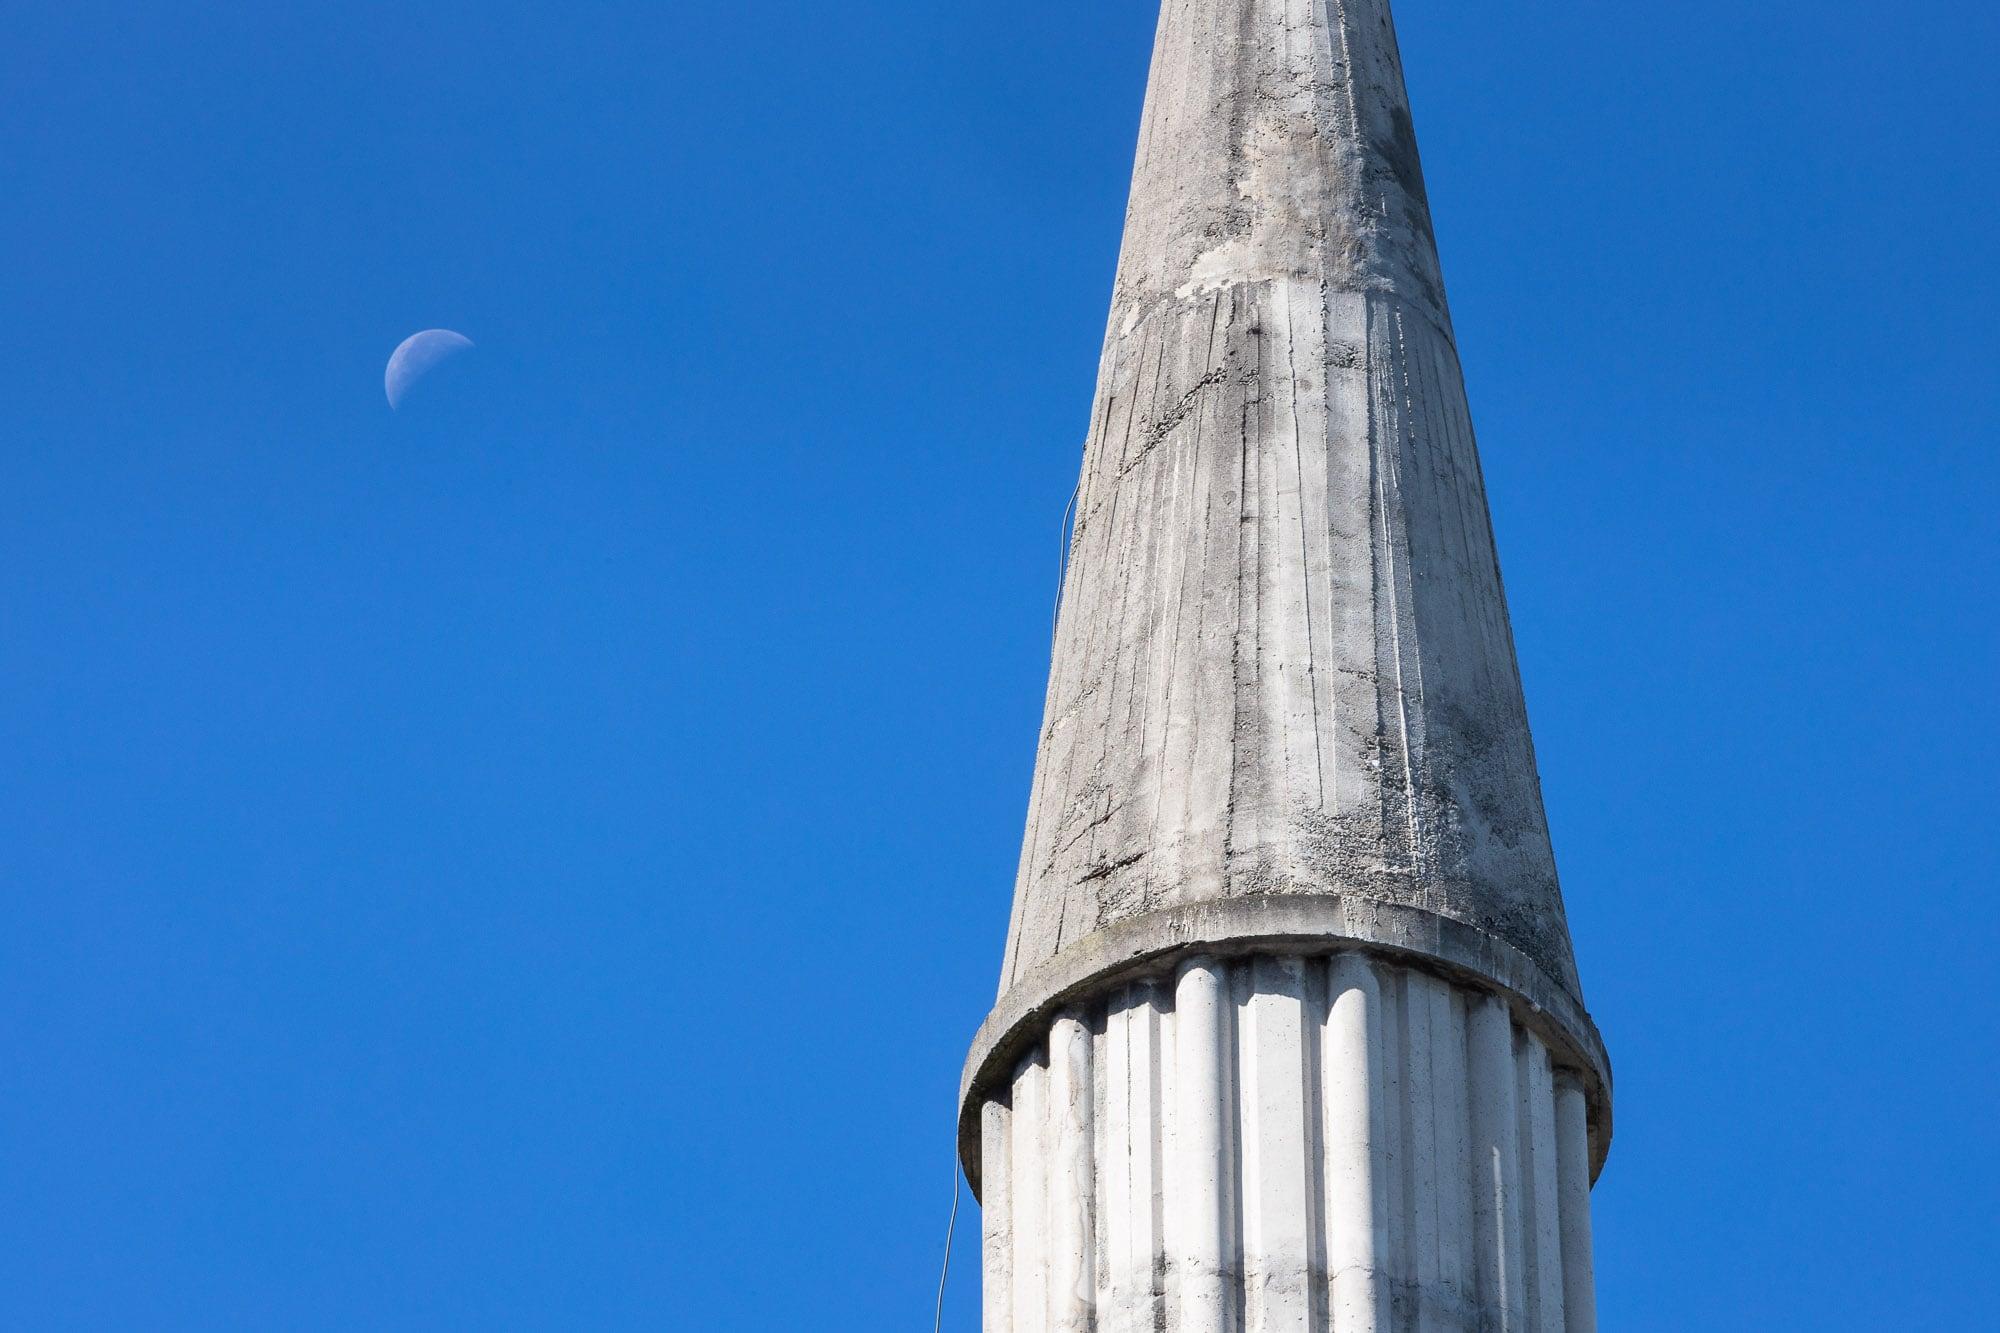 moon and minaret